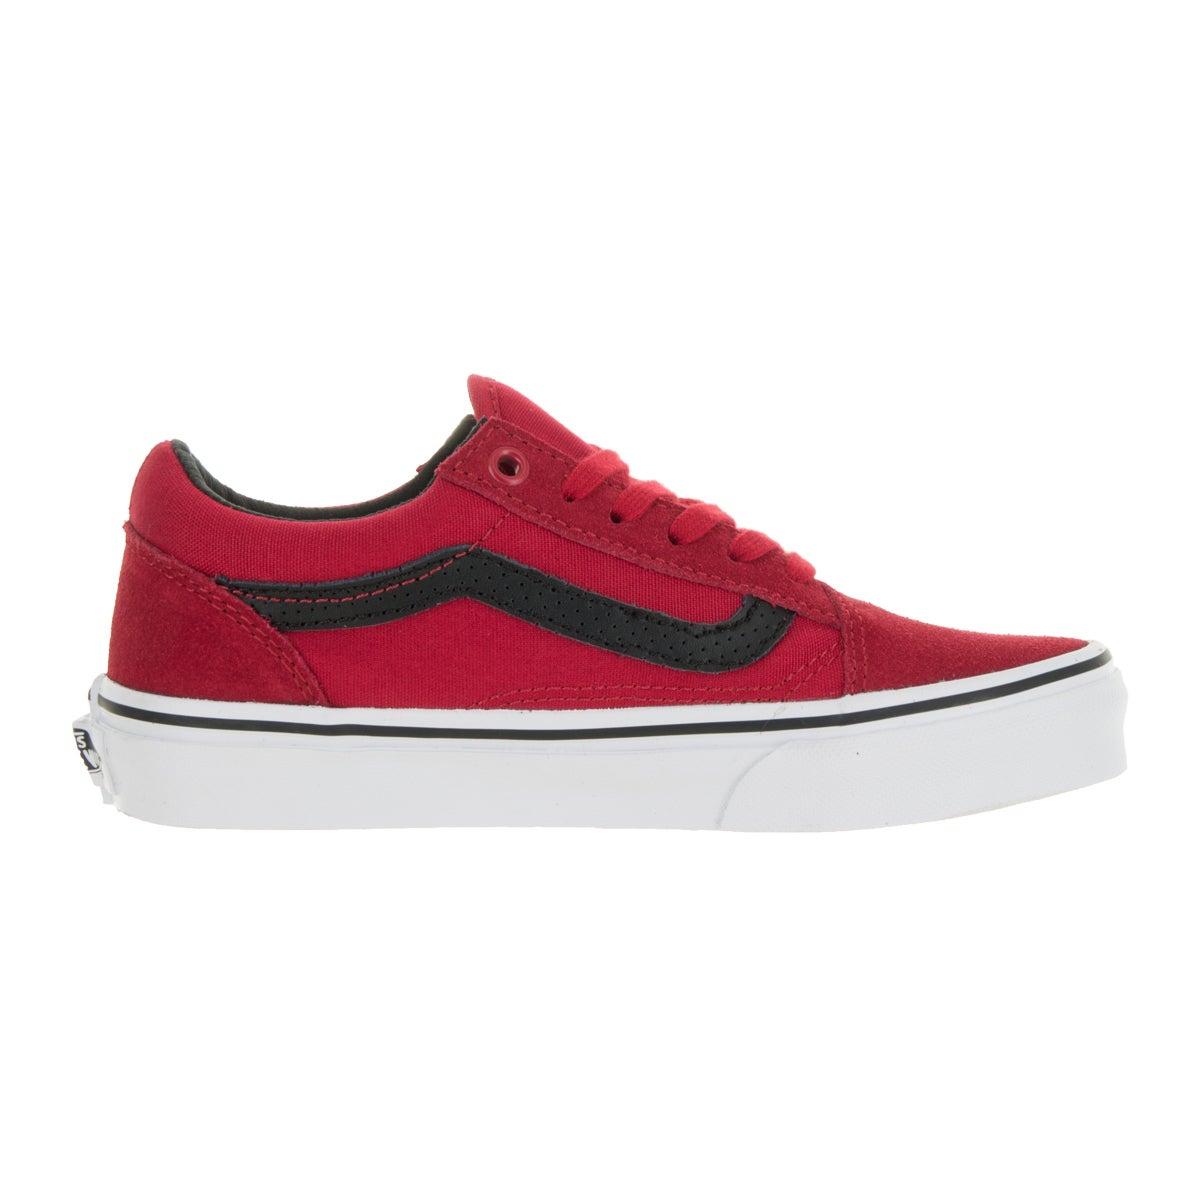 de1d8951f8 Shop Vans Kids Old Skool (C P) Racing Red Black Suede Skate Shoe - Free  Shipping Today - Overstock - 13344506